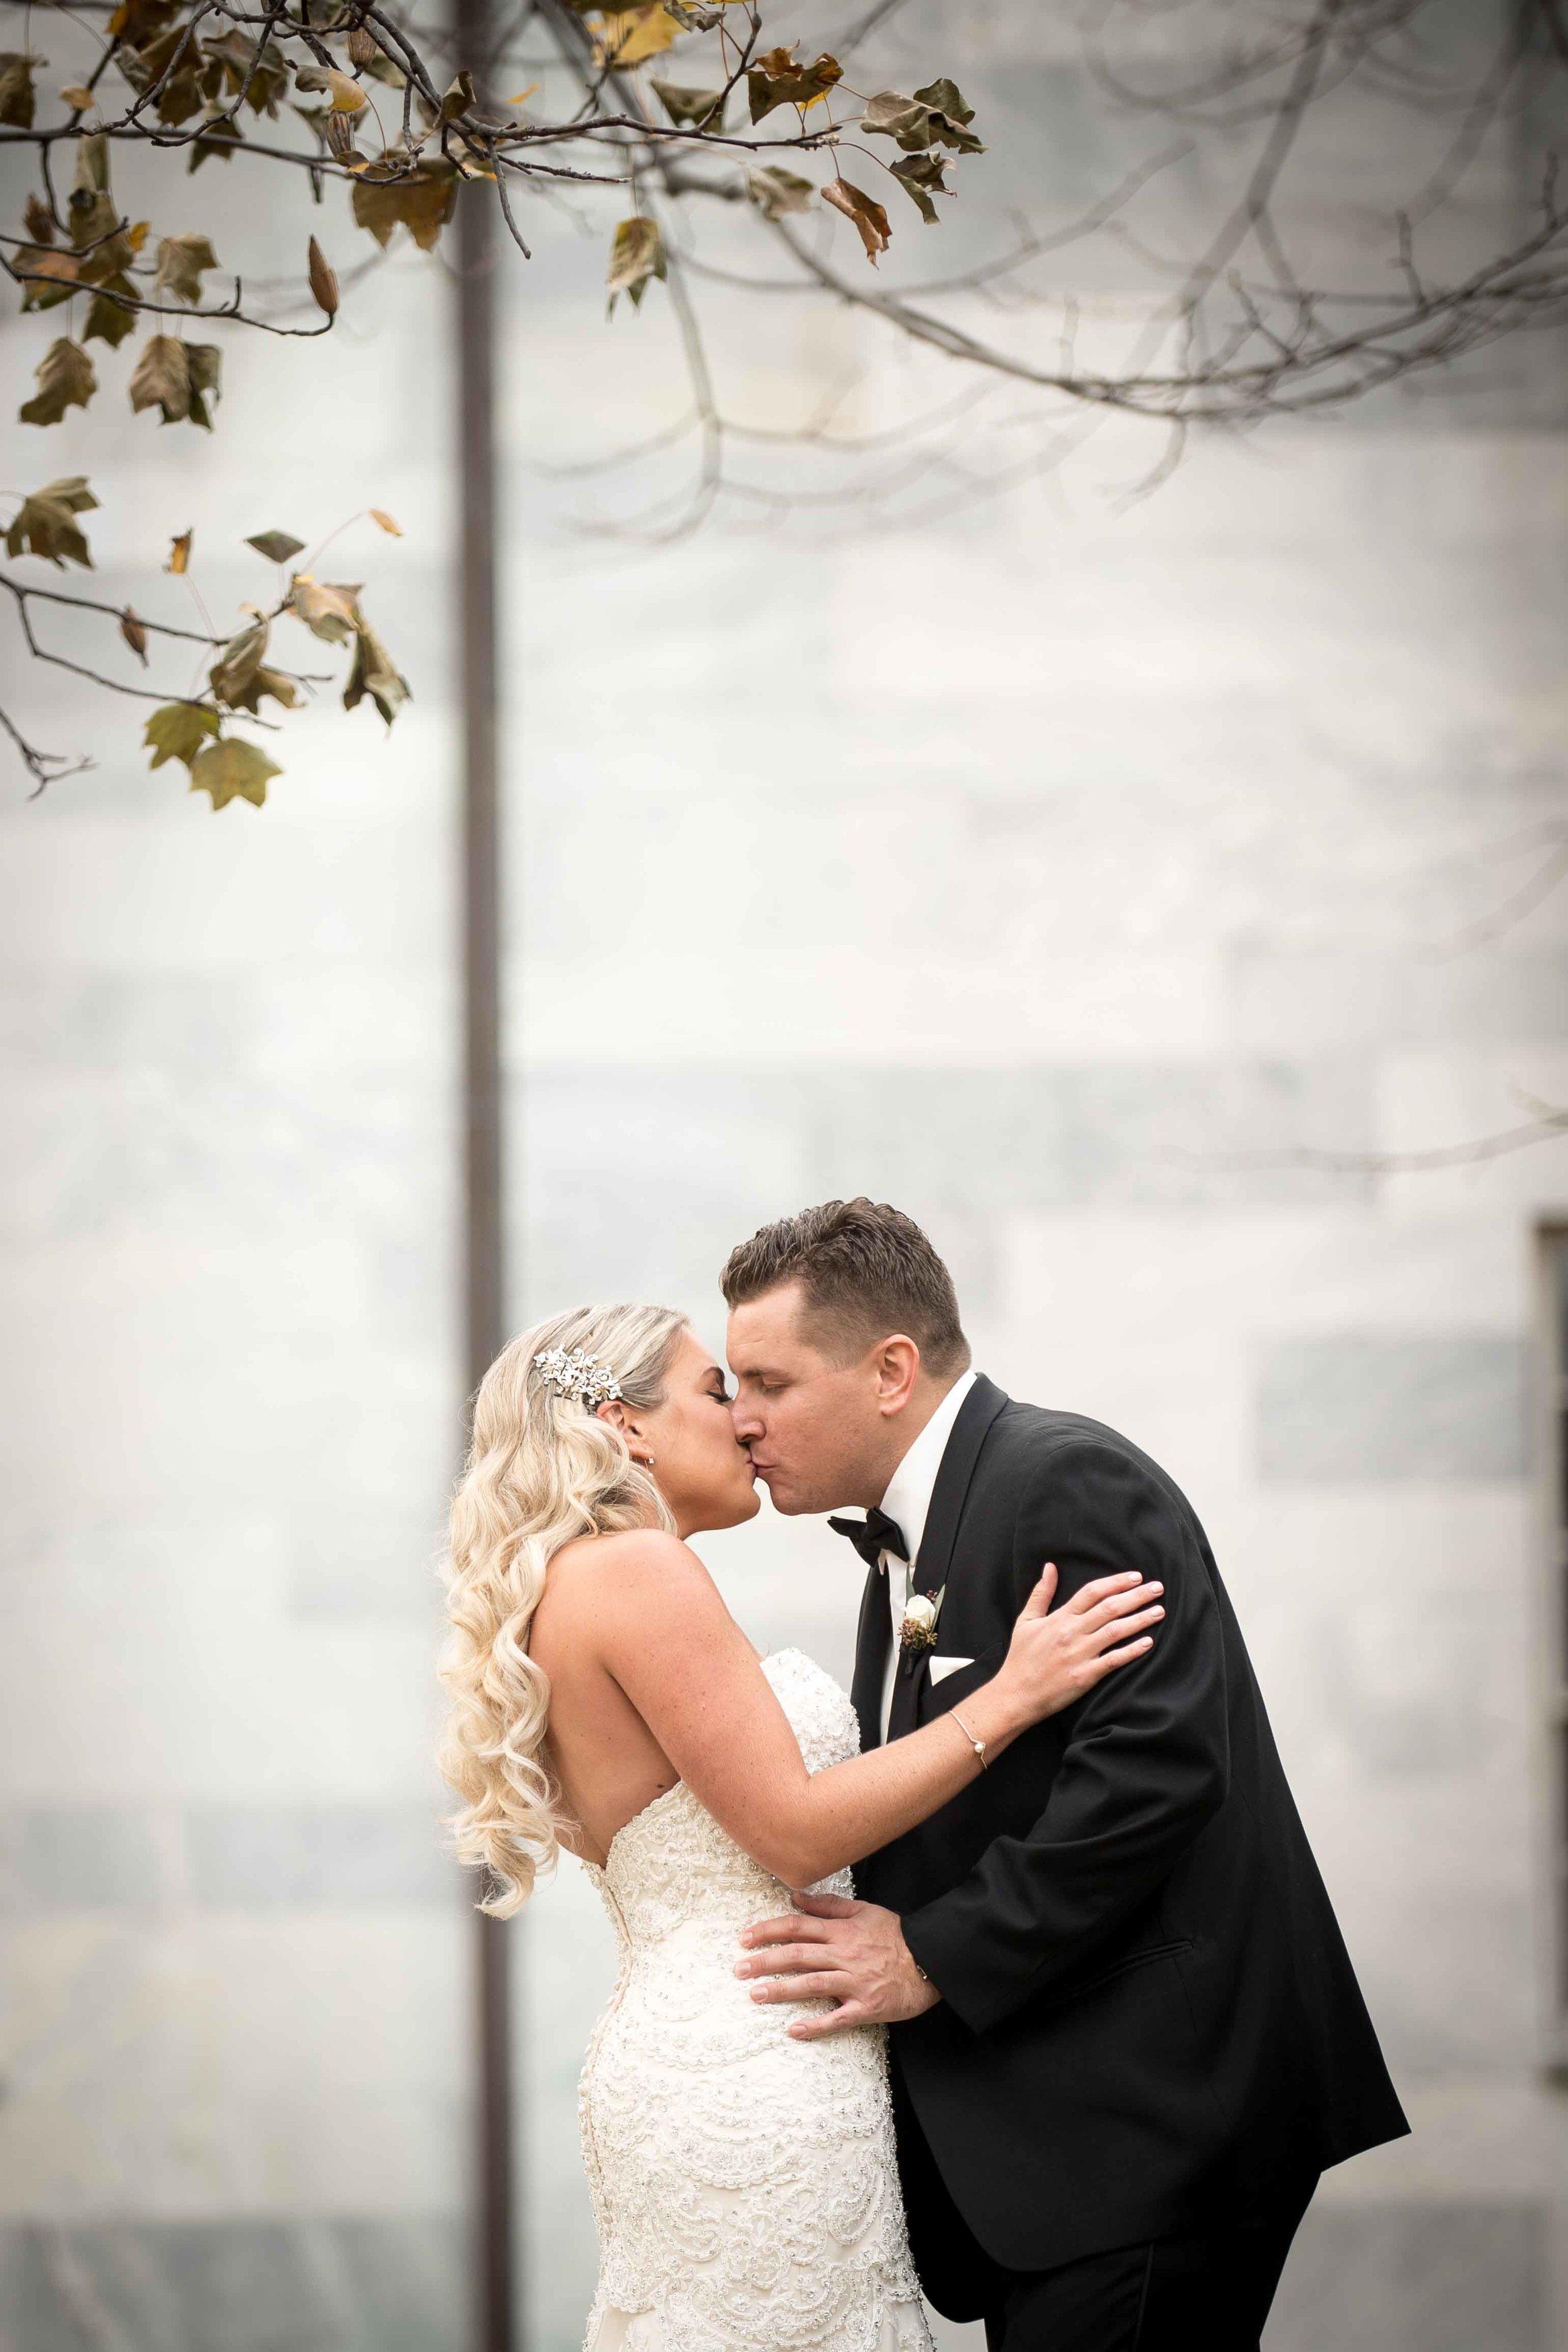 wedding - planning